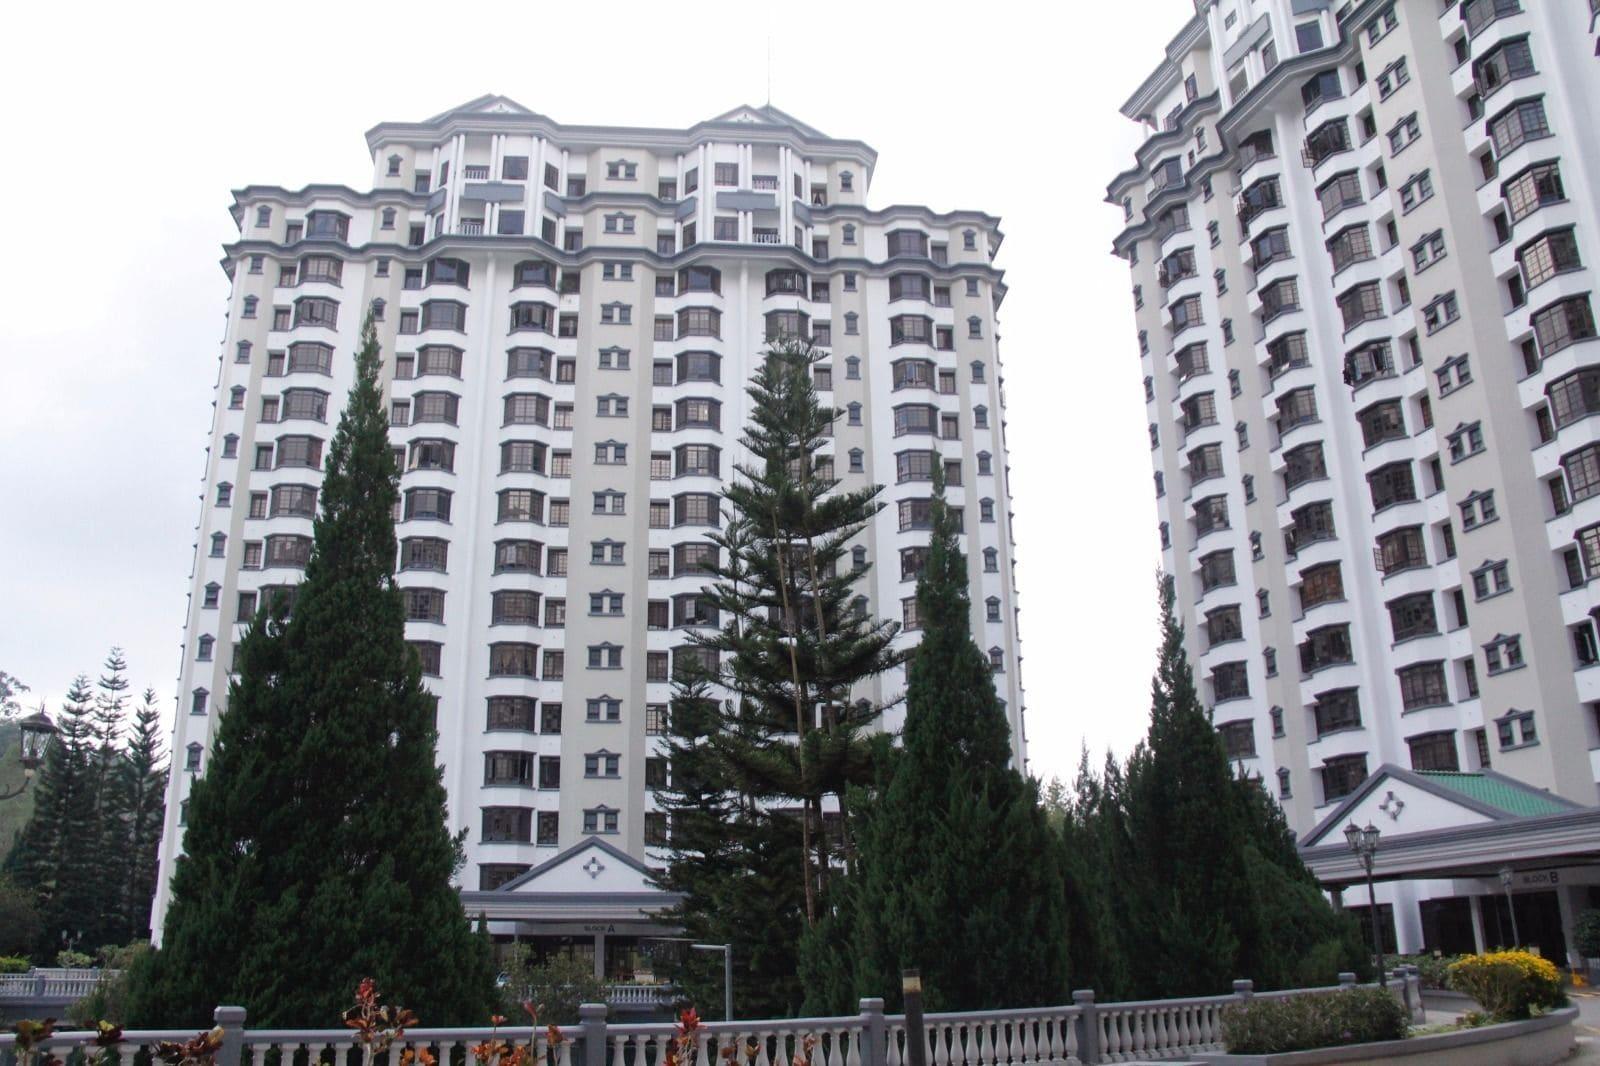 Luxury Mawar Apartments Genting Highlands, Bentong